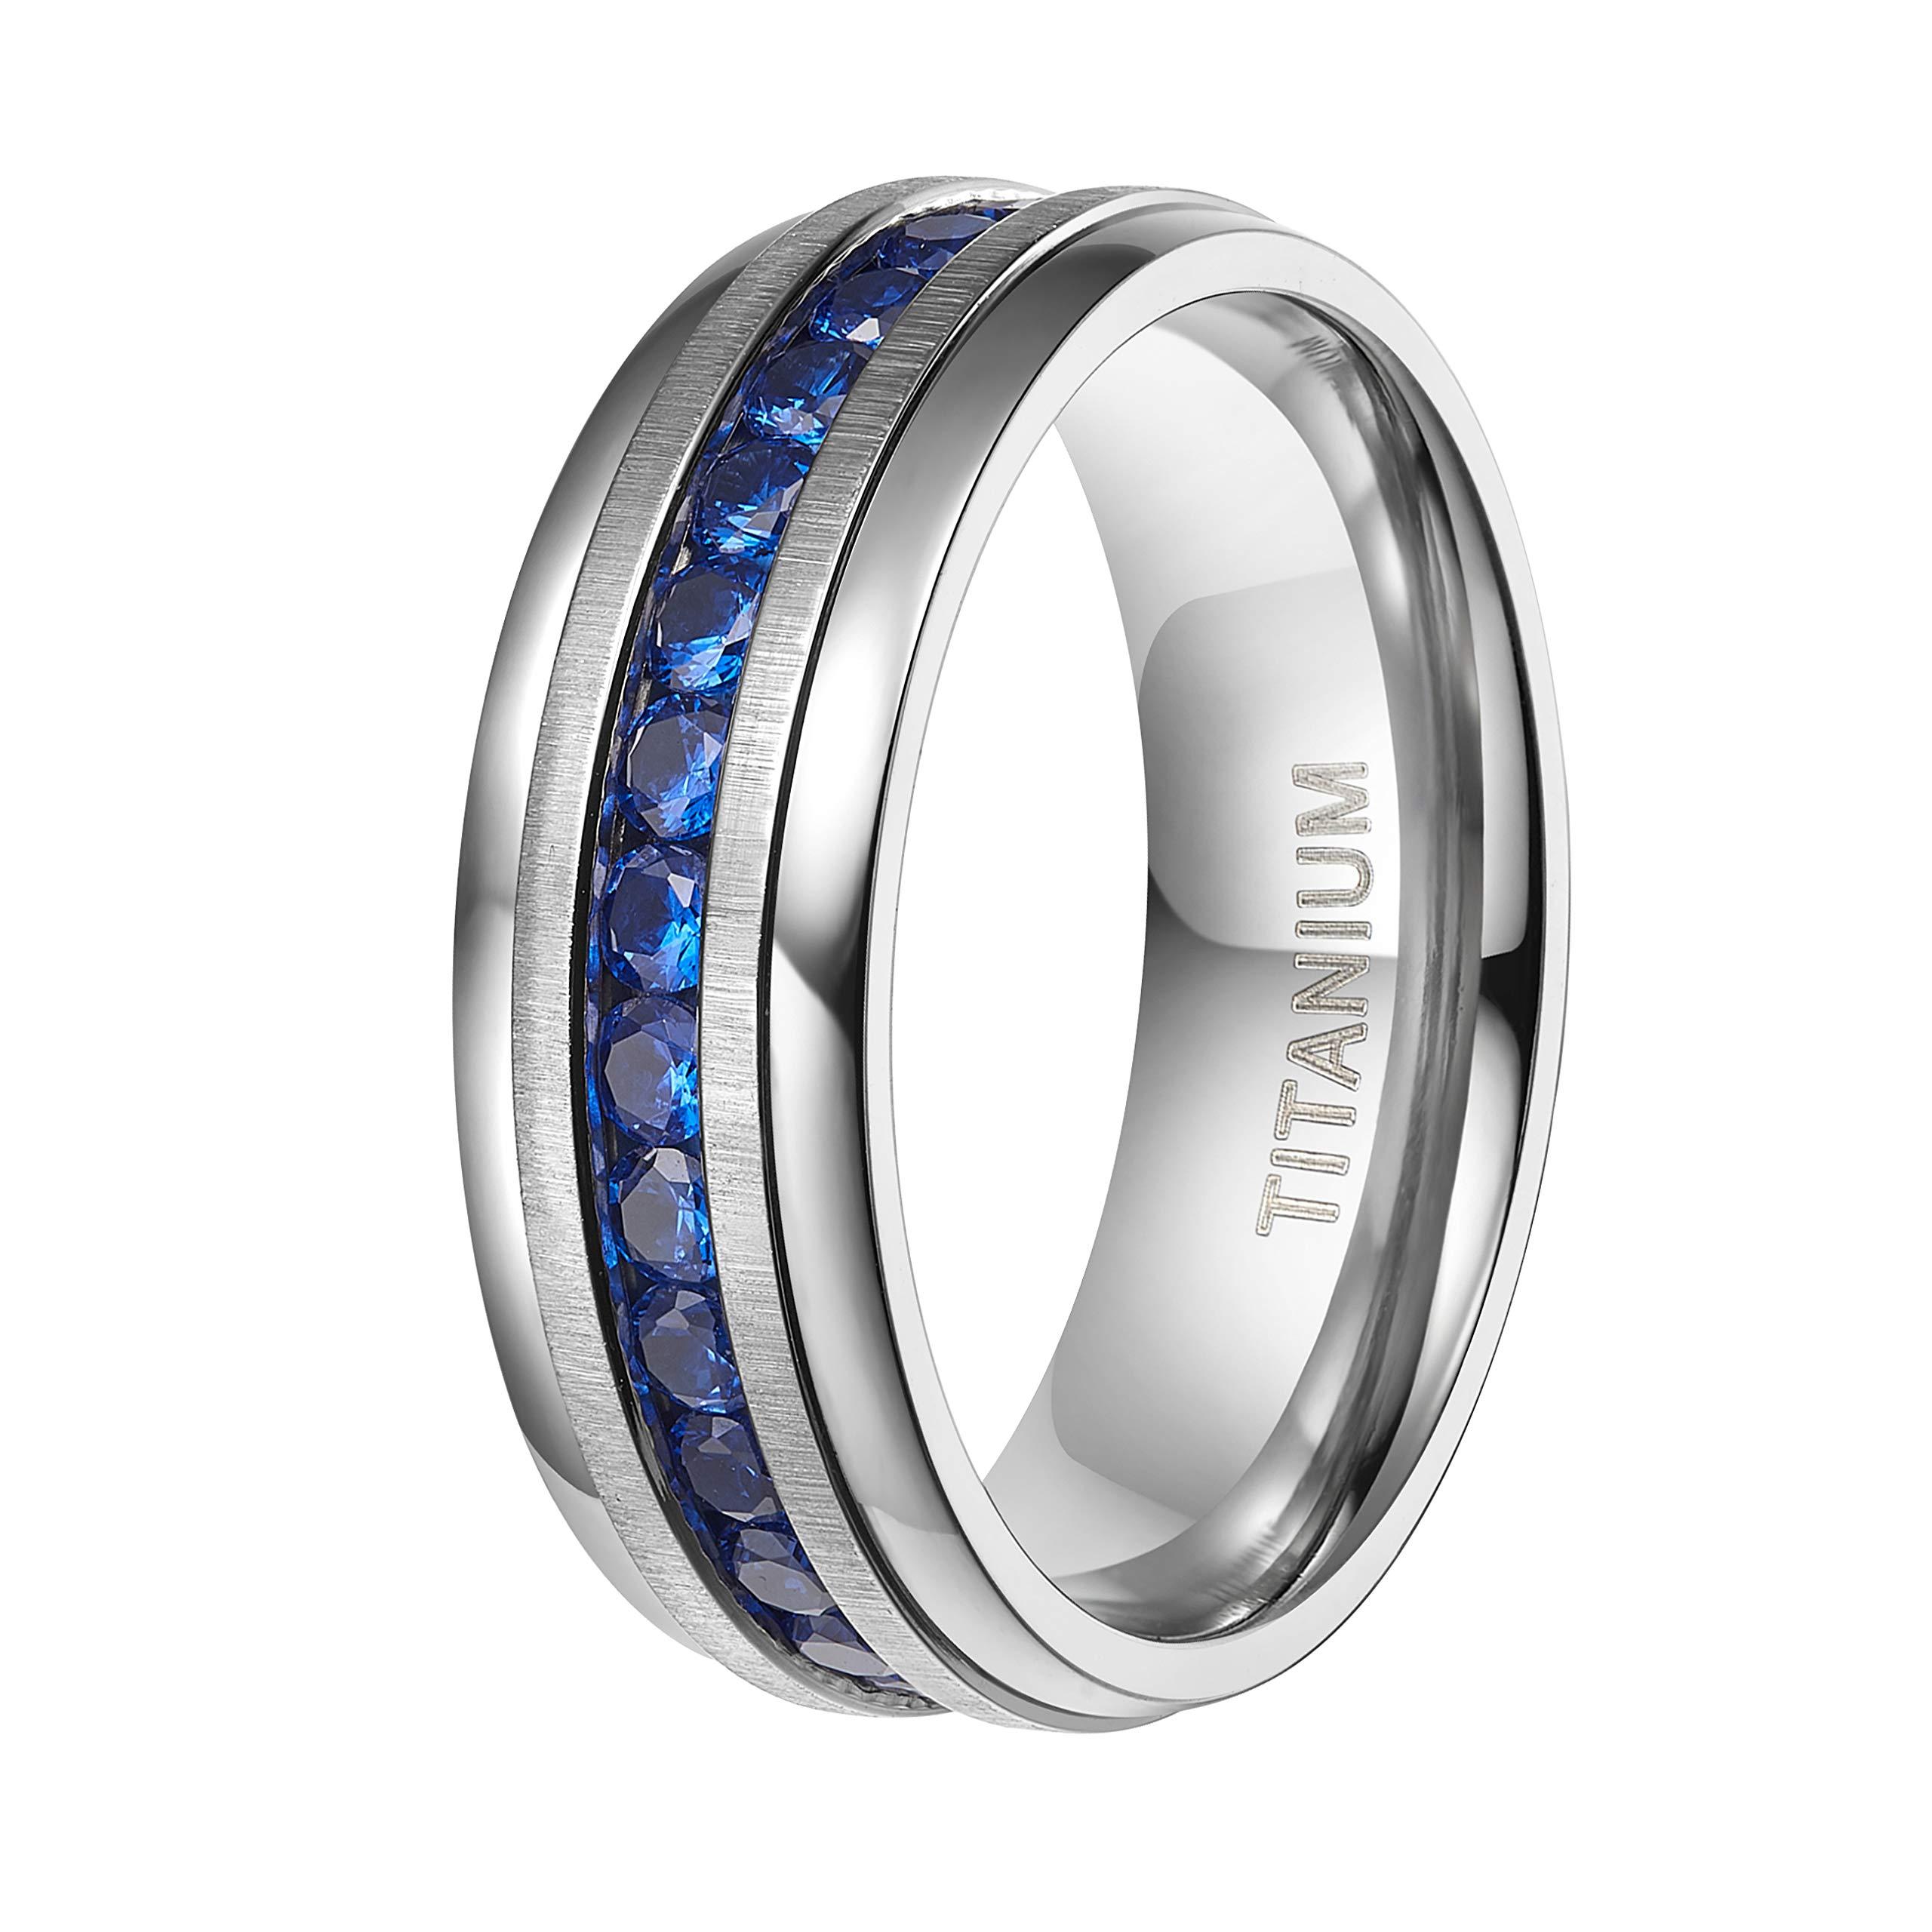 TIGRADE 8MM Man's Titanium Rings Wedding Bands Cubic Zirconia Inlay Size 11.5